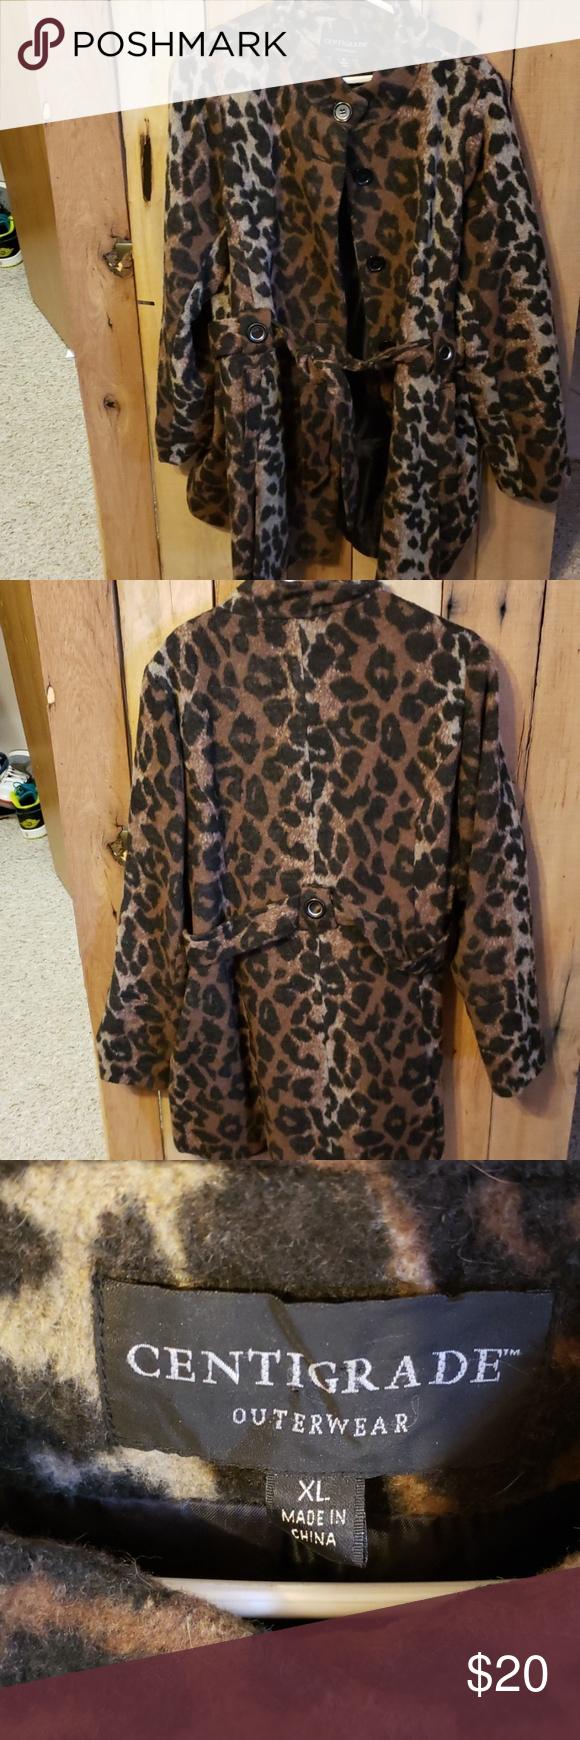 Centigrade Outerwear Coat Clothes Design Leopard Print Coat Outerwear Coats [ 1740 x 580 Pixel ]